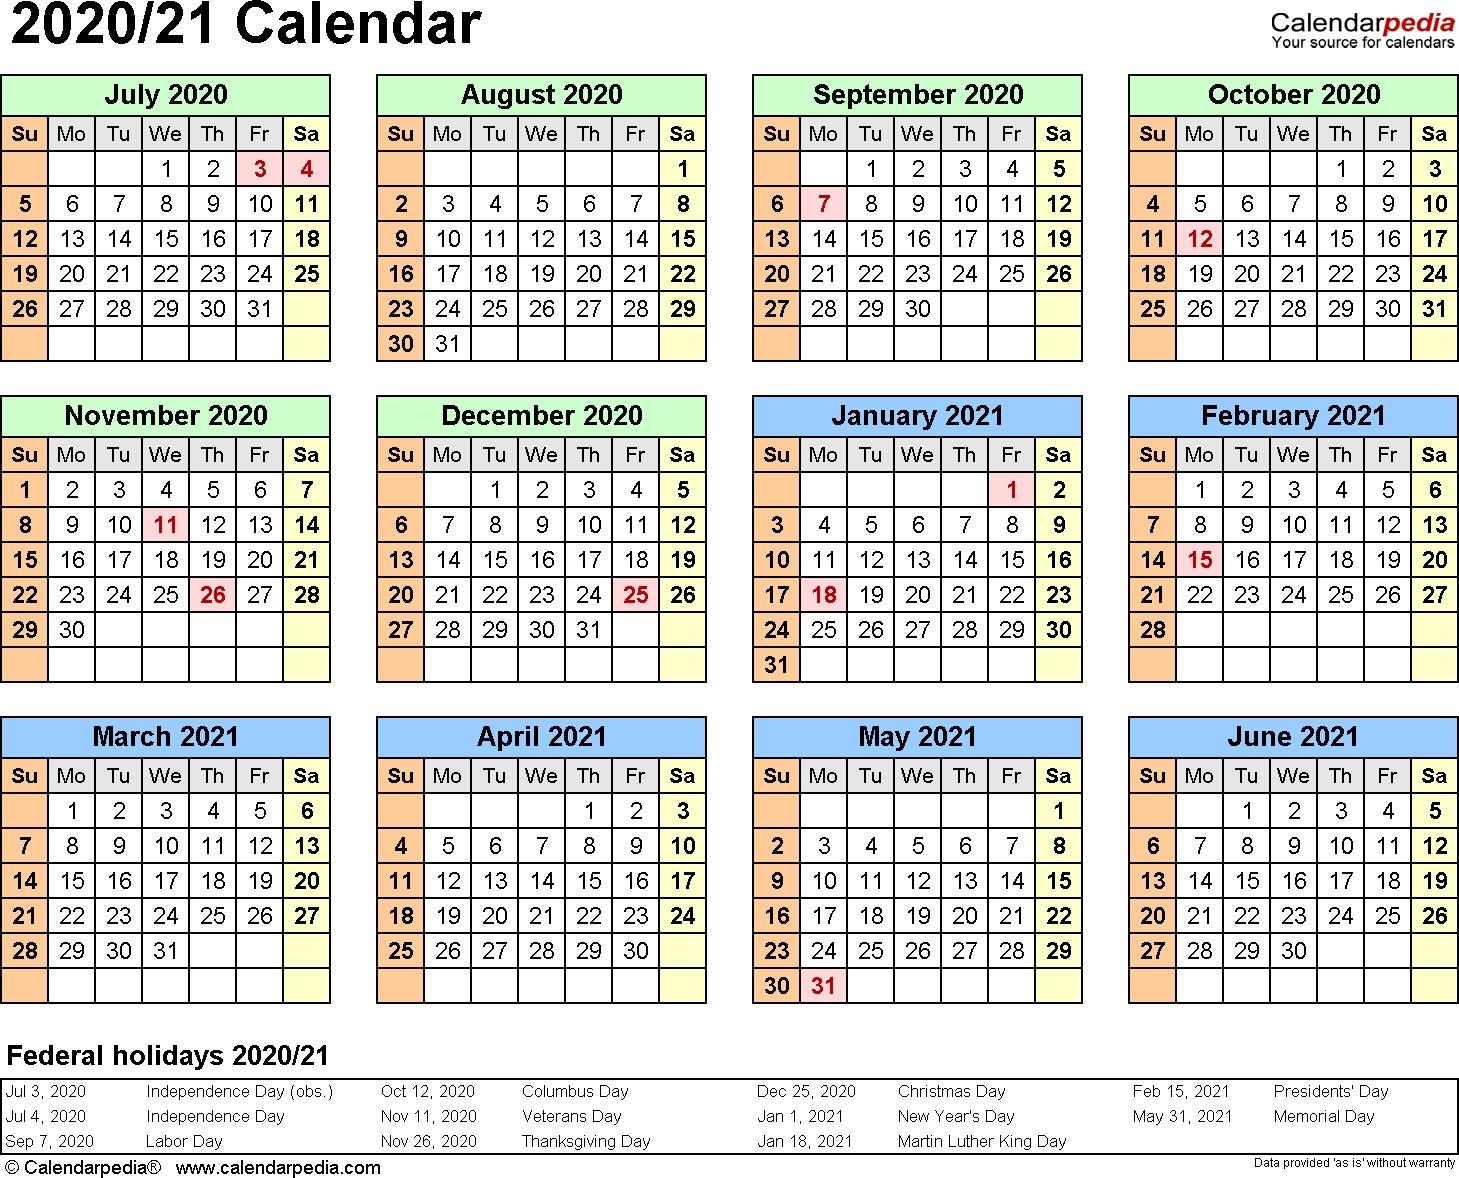 Split Year Calendars 2020/2021 (July To June) - Word Templates-Microsoft Word Template 2020 Calendar